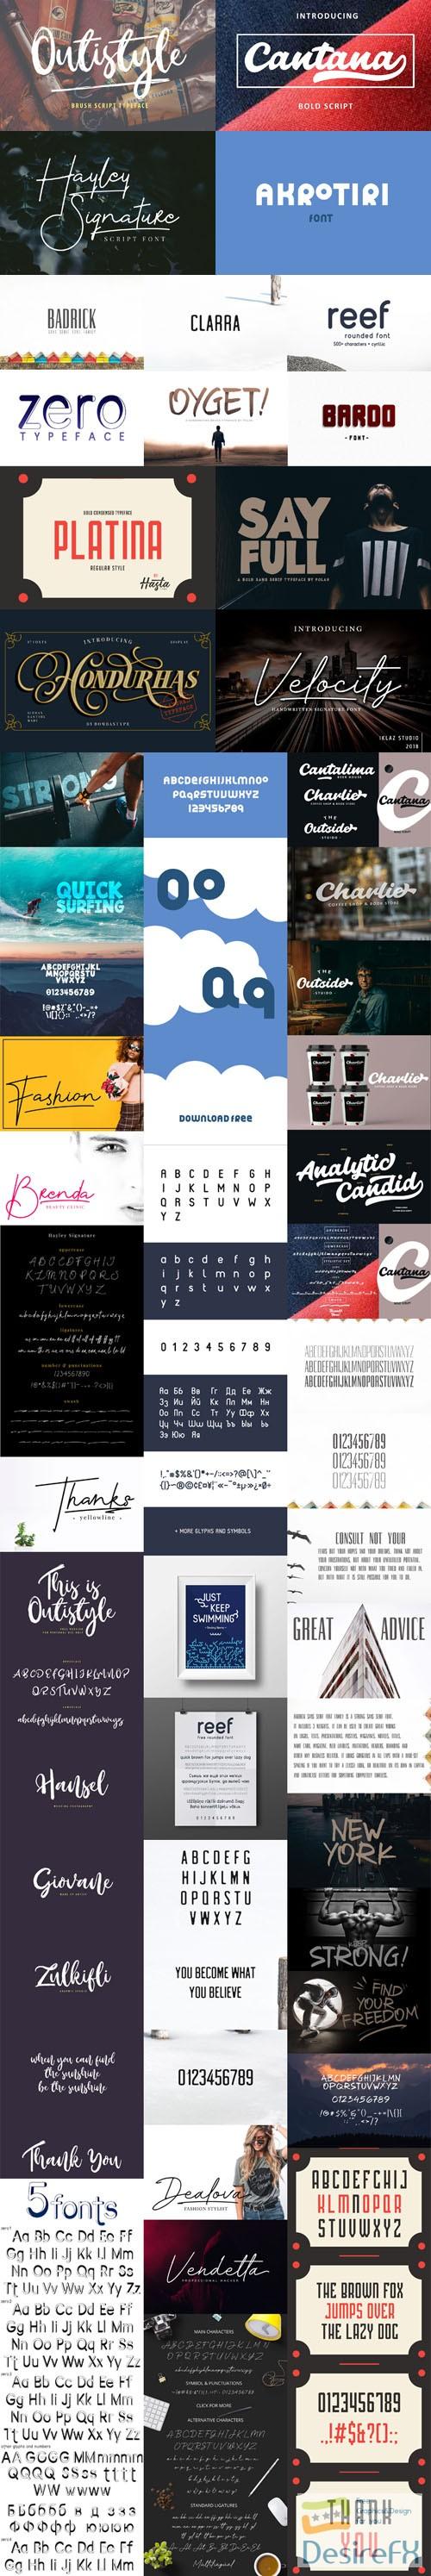 fonts - 14 Fonts Collection (Multilingual) [TTF/OTF/WebFonts Kit]